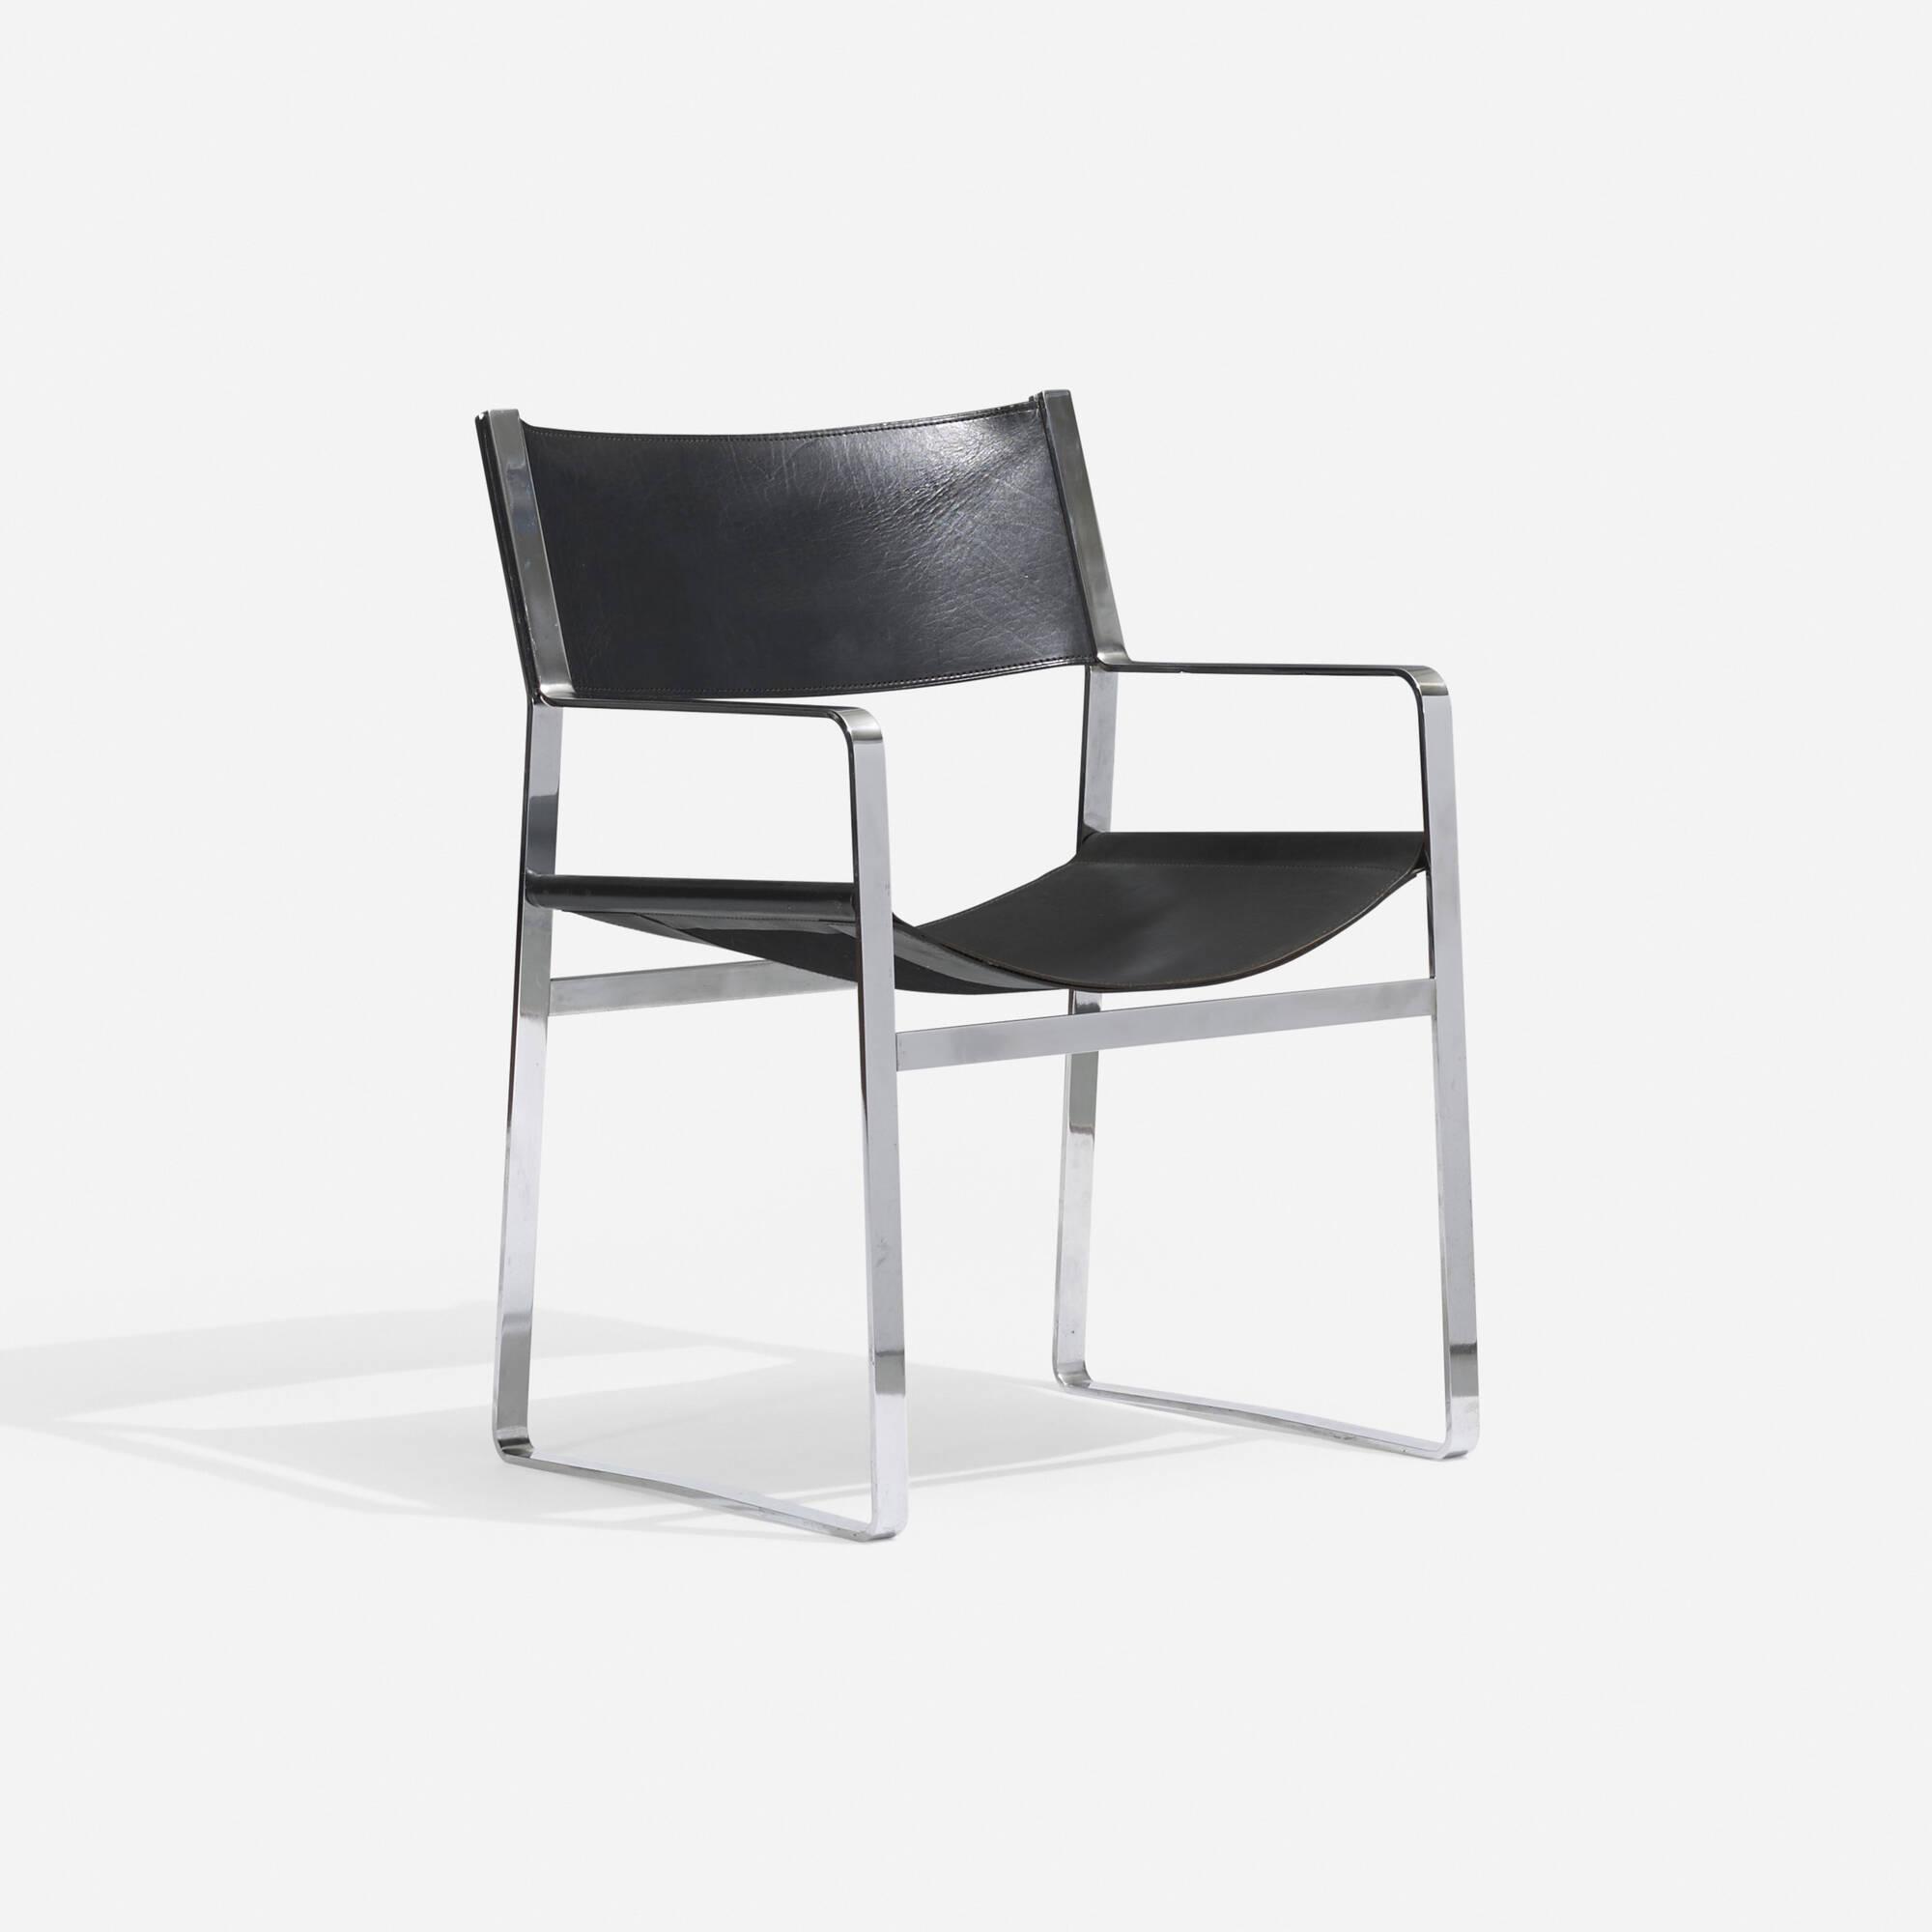 341: Hans J. Wegner / armchair, model JH812 (2 of 3)